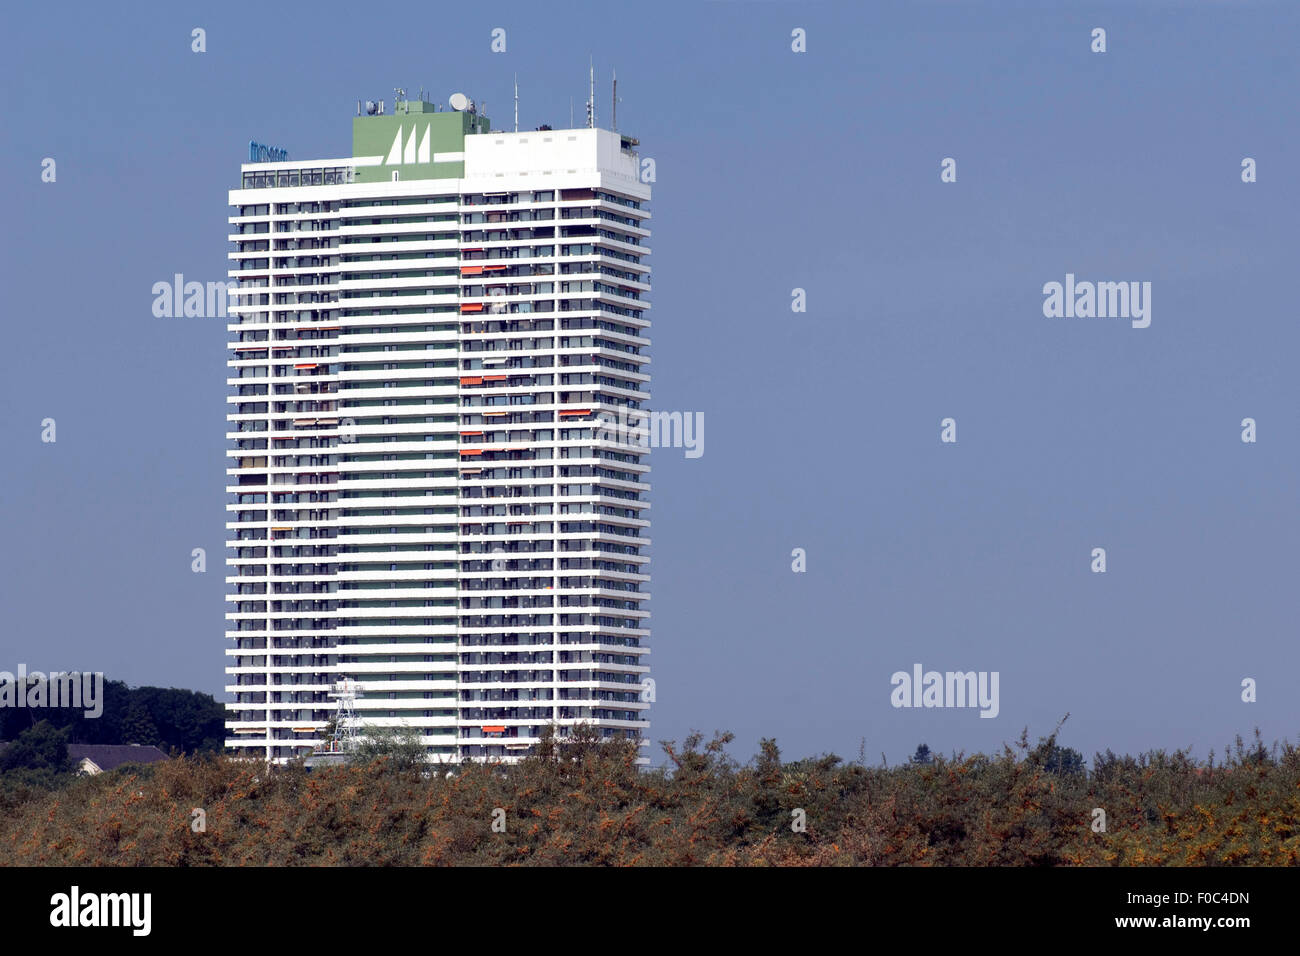 Strandhotel, Maritim, Travemuende, - Stock Image